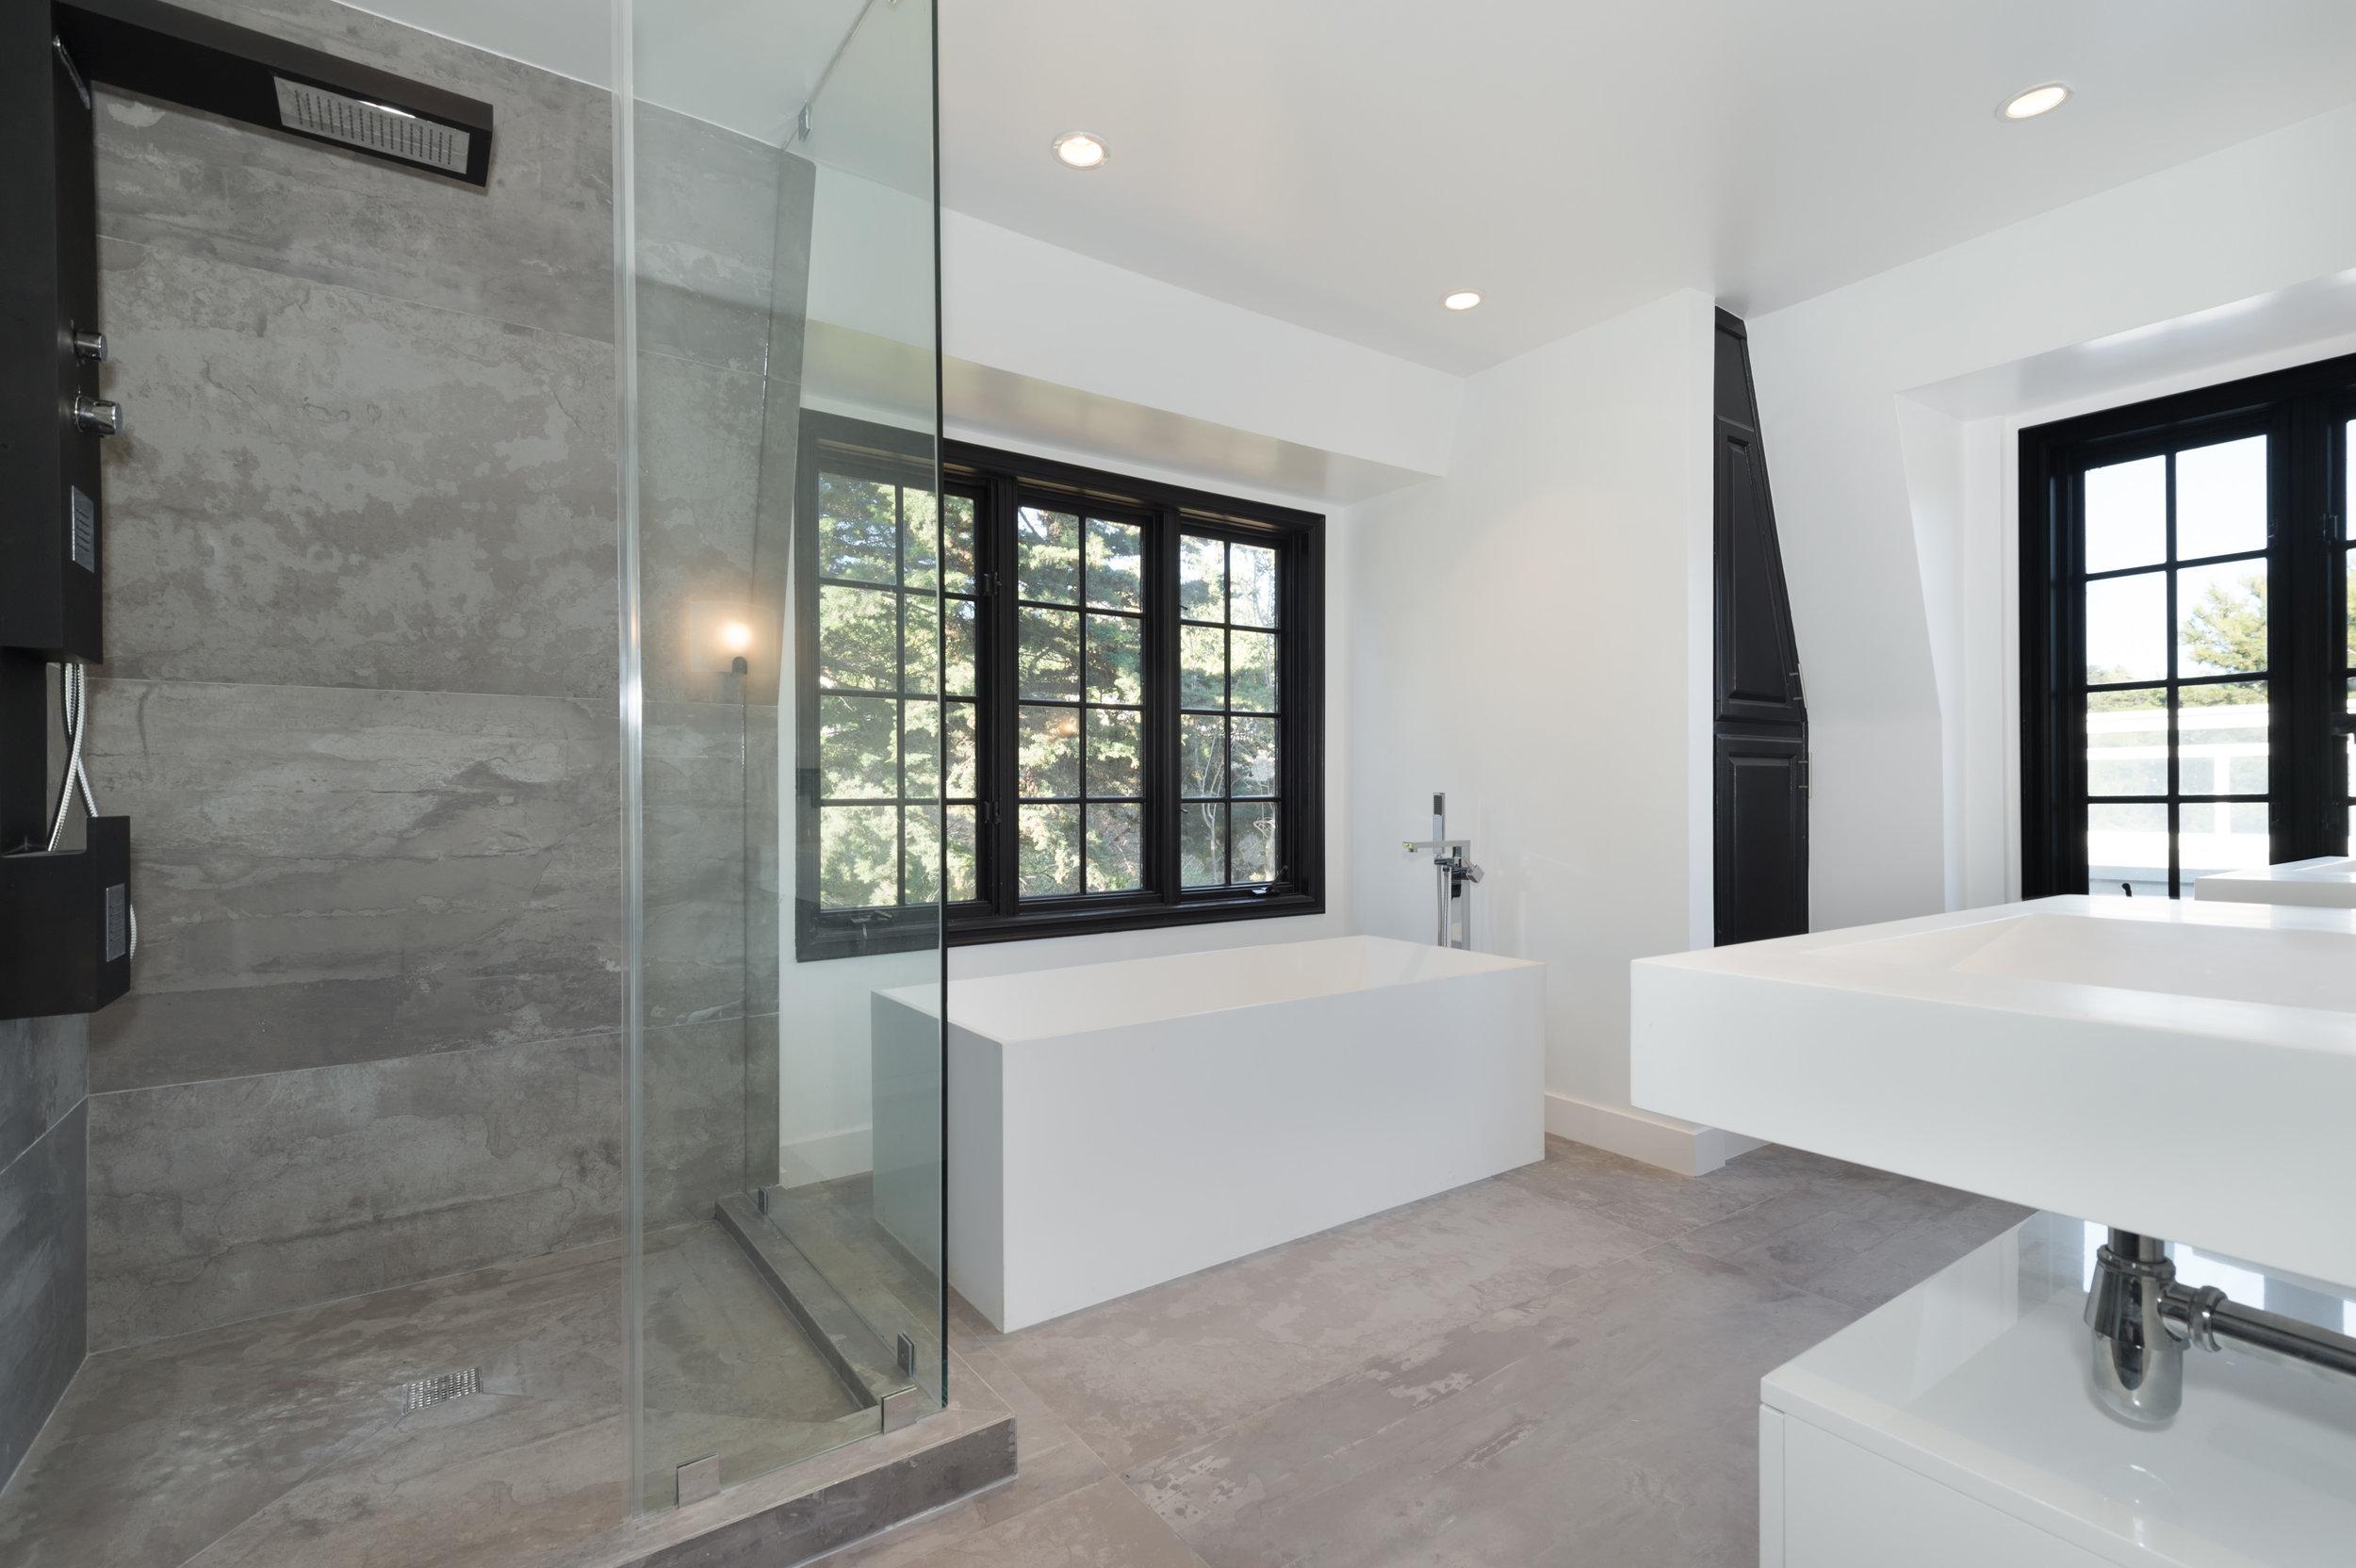 015 bathroom 30340 Morning View Malibu For Sale The Malibu Life Team Luxury Real Estate.jpg